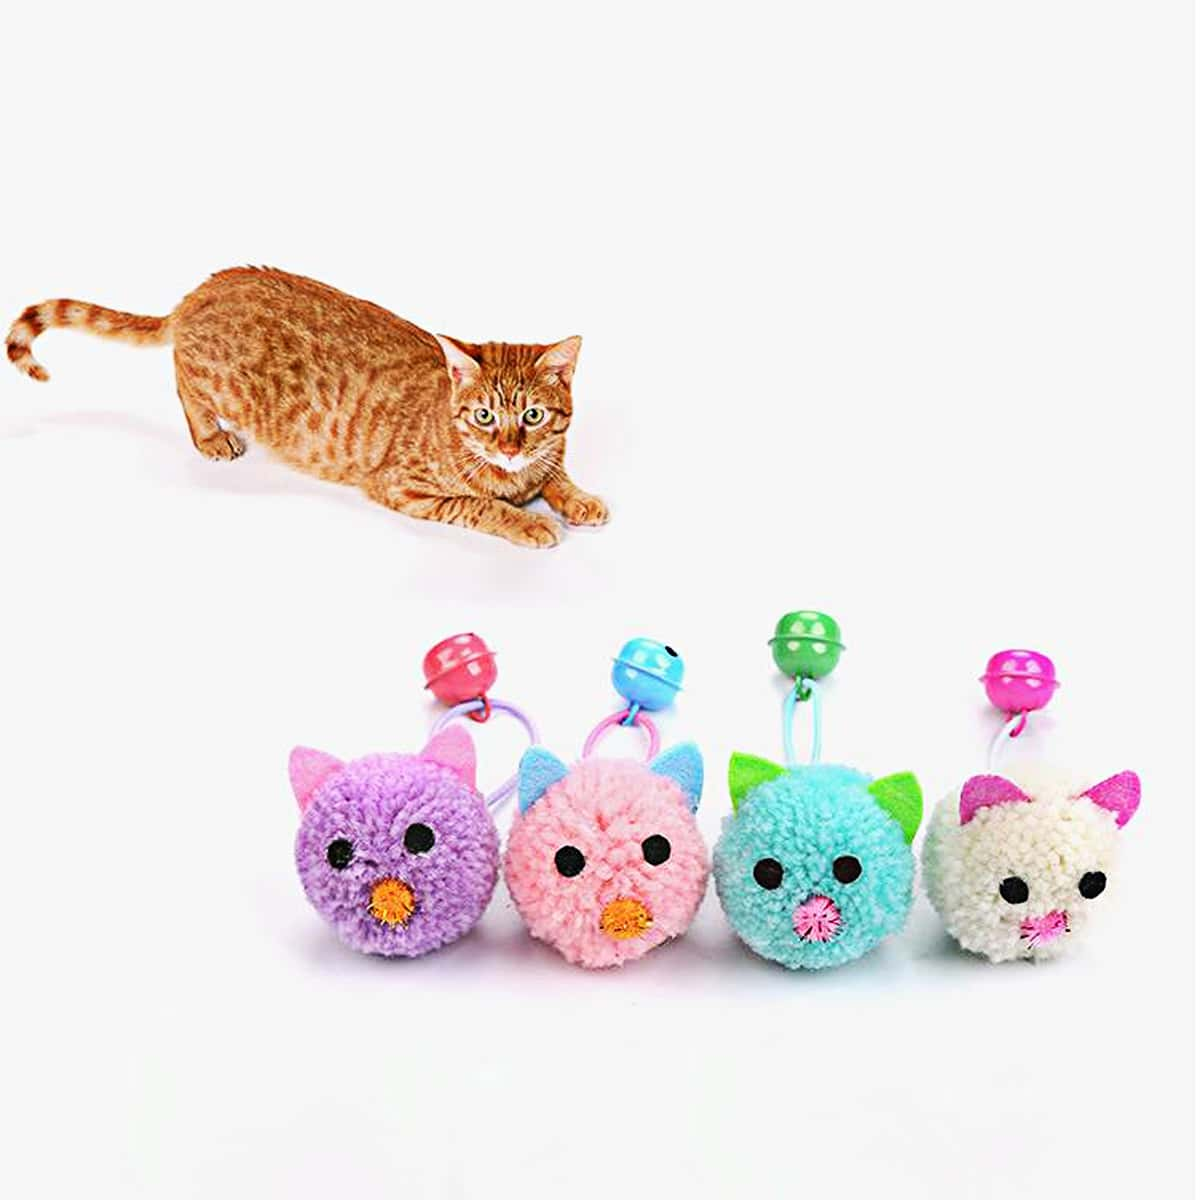 1 Stück Zufällige Farbe Katzenspielzeug in Mausform